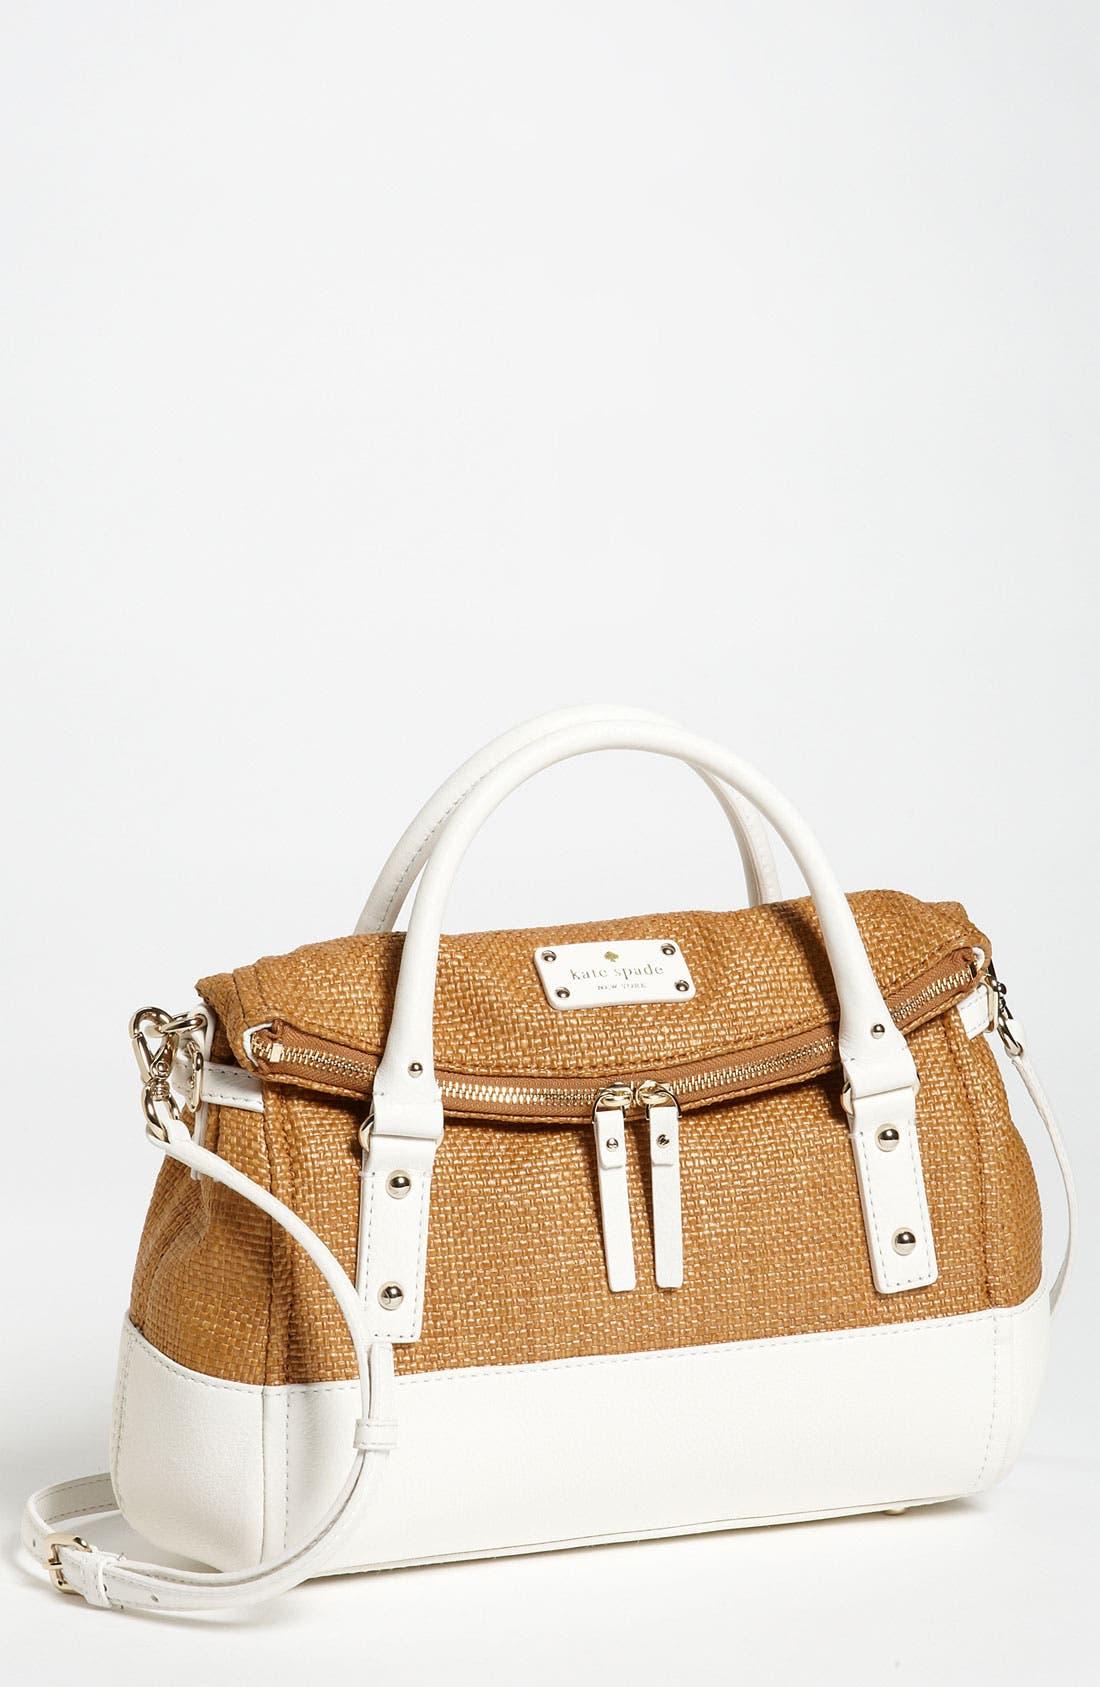 Main Image - kate spade new york 'leslie - small' straw satchel